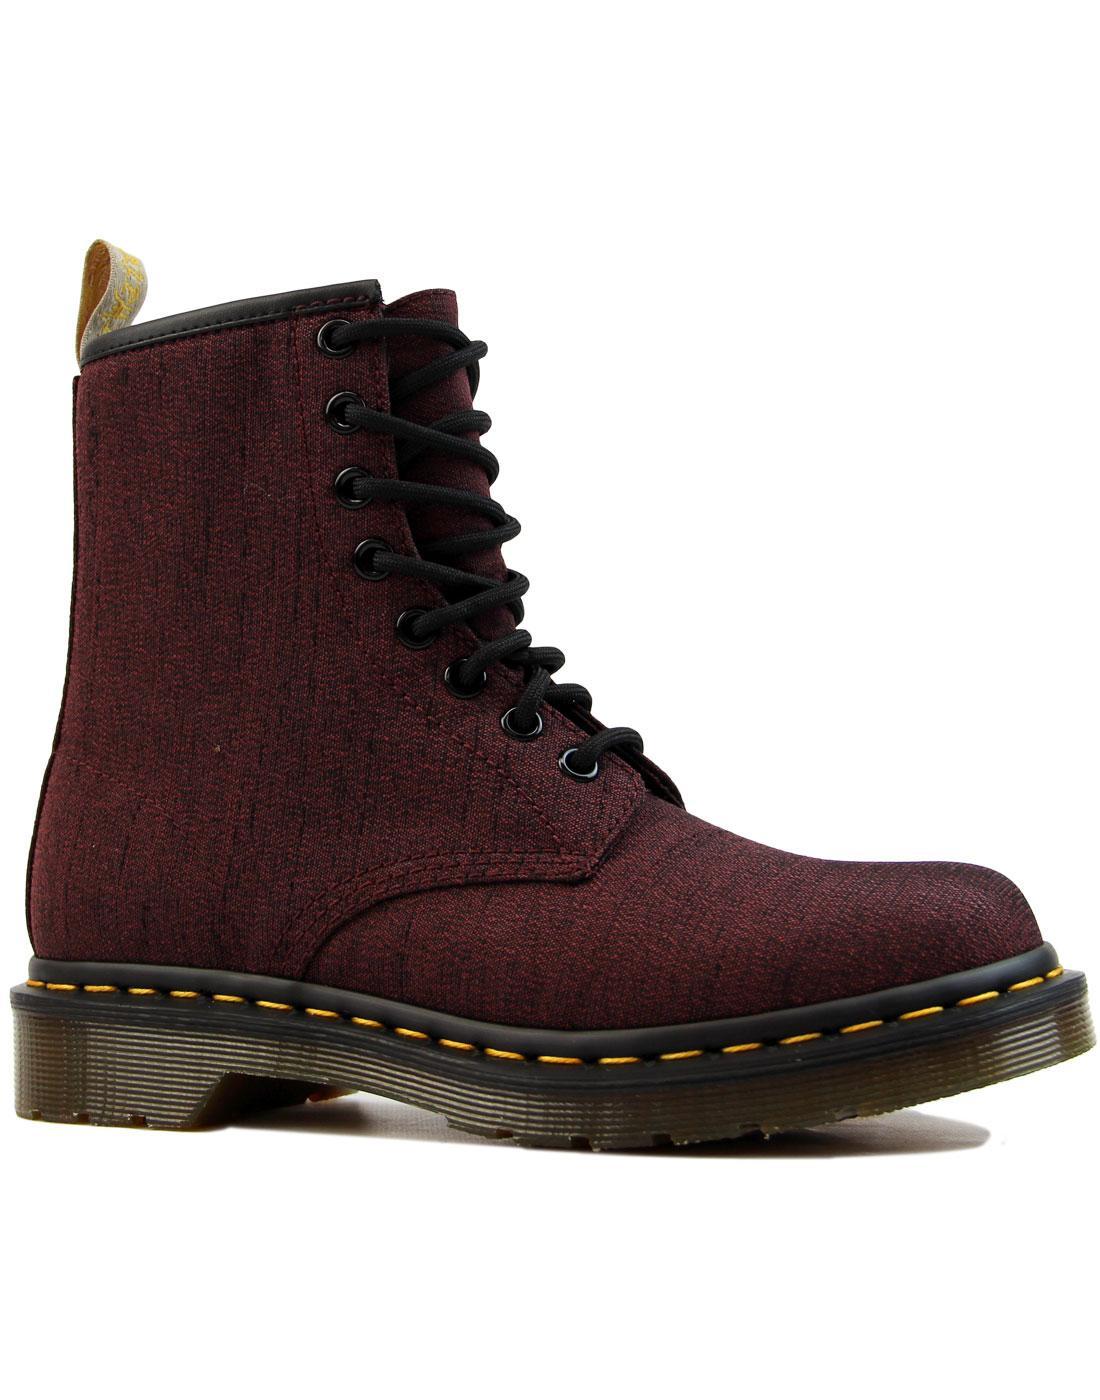 Vegan Castel 1460 DR MARTENS Cherry Serge Boots